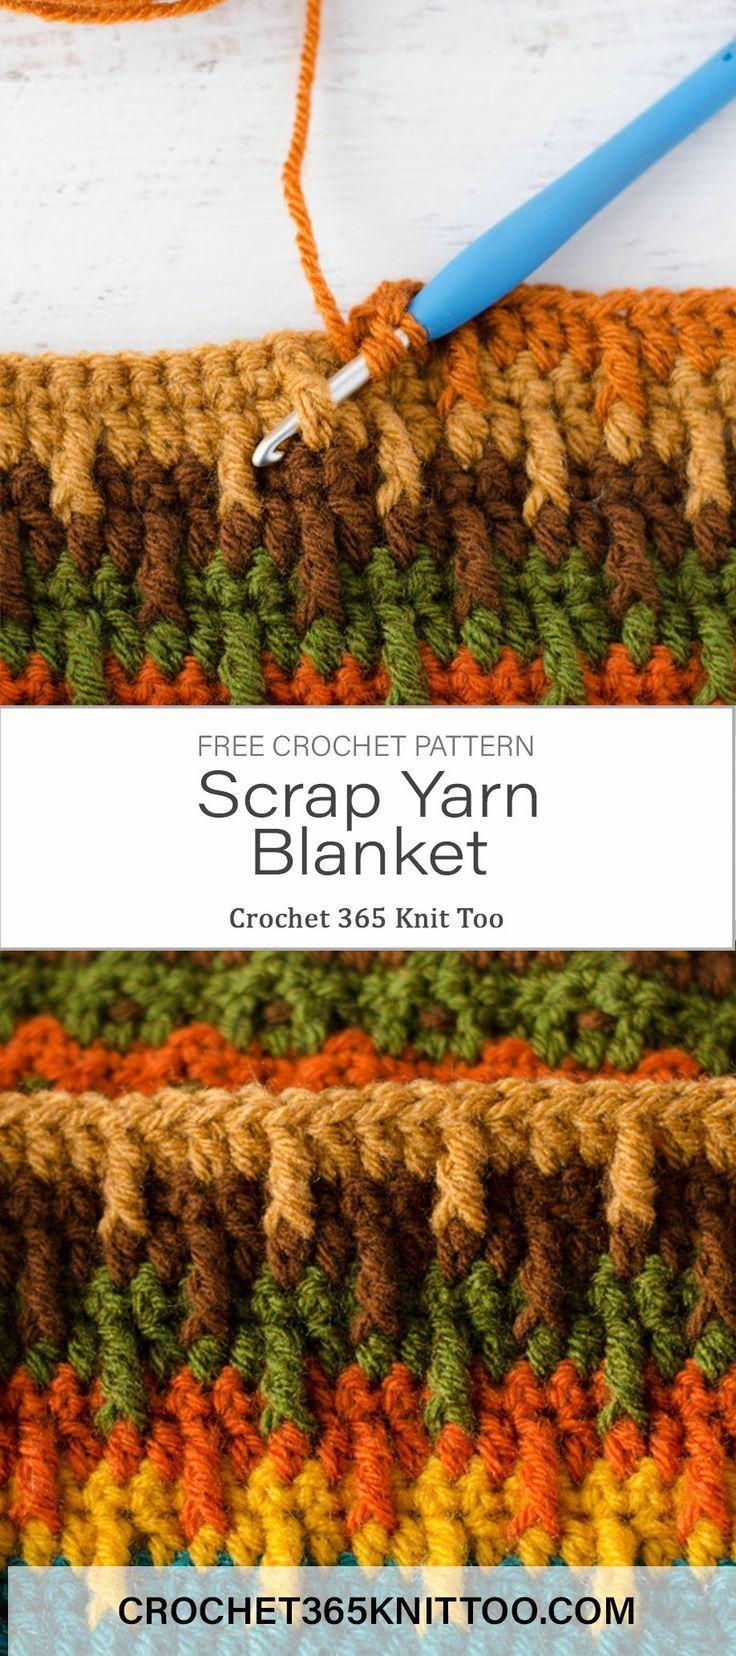 Onward and Upward Scrap Afghan Project – Crochet 365 Knit Too